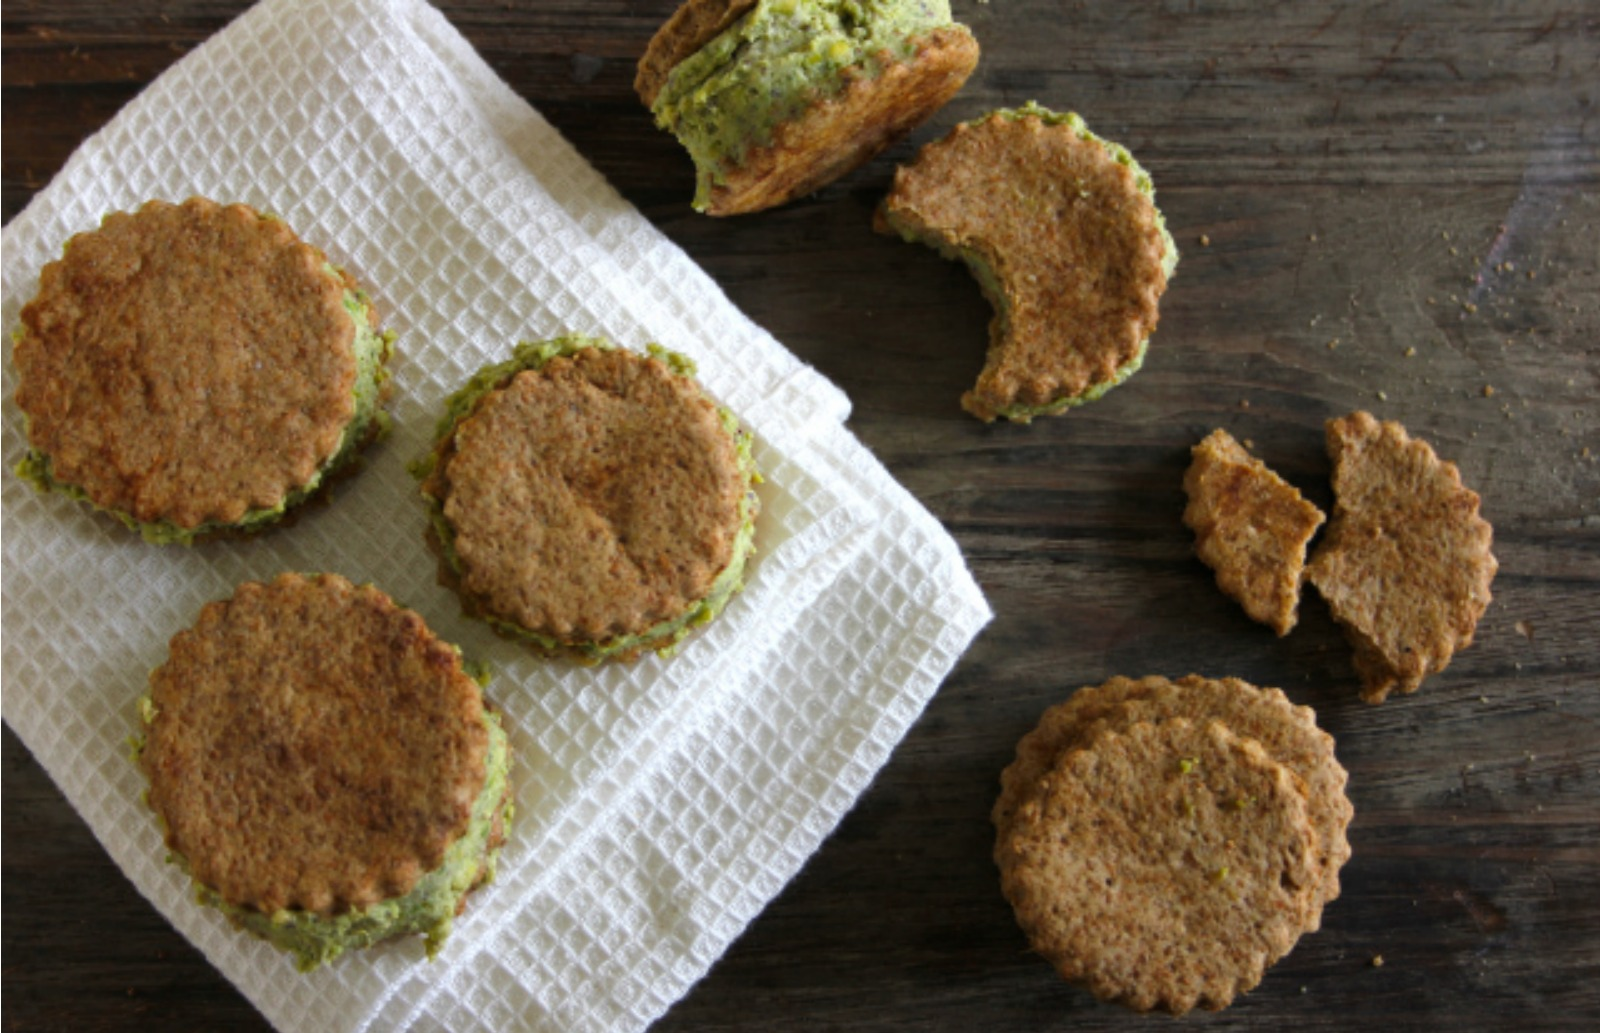 Ice Cream Sandwiches: Espresso Biscuits With Pistachio Ice Cream [Vegan, Sugar-Free]